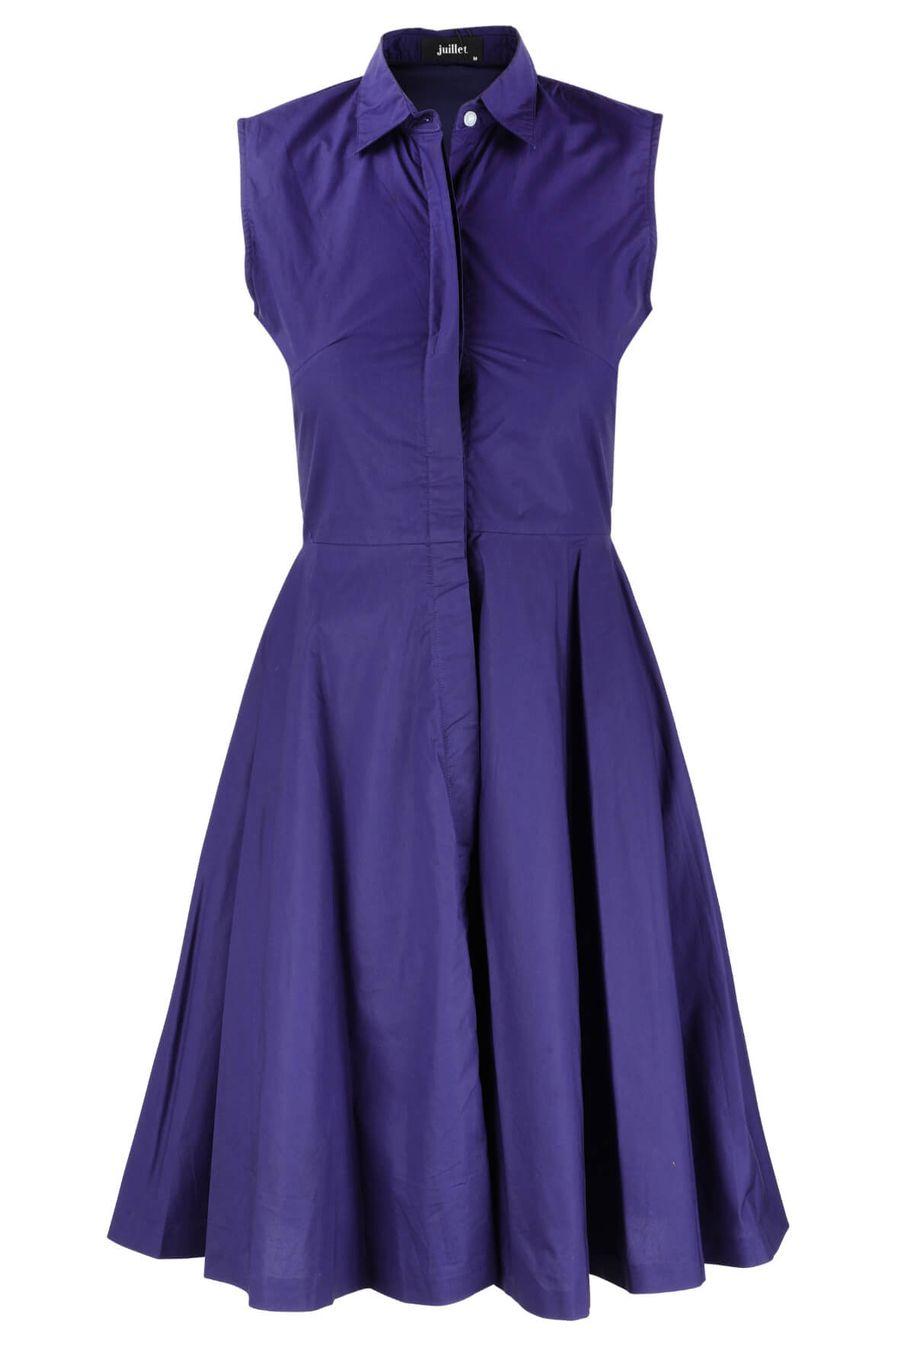 Style Theory_juillet-mara-shirt-dress-1